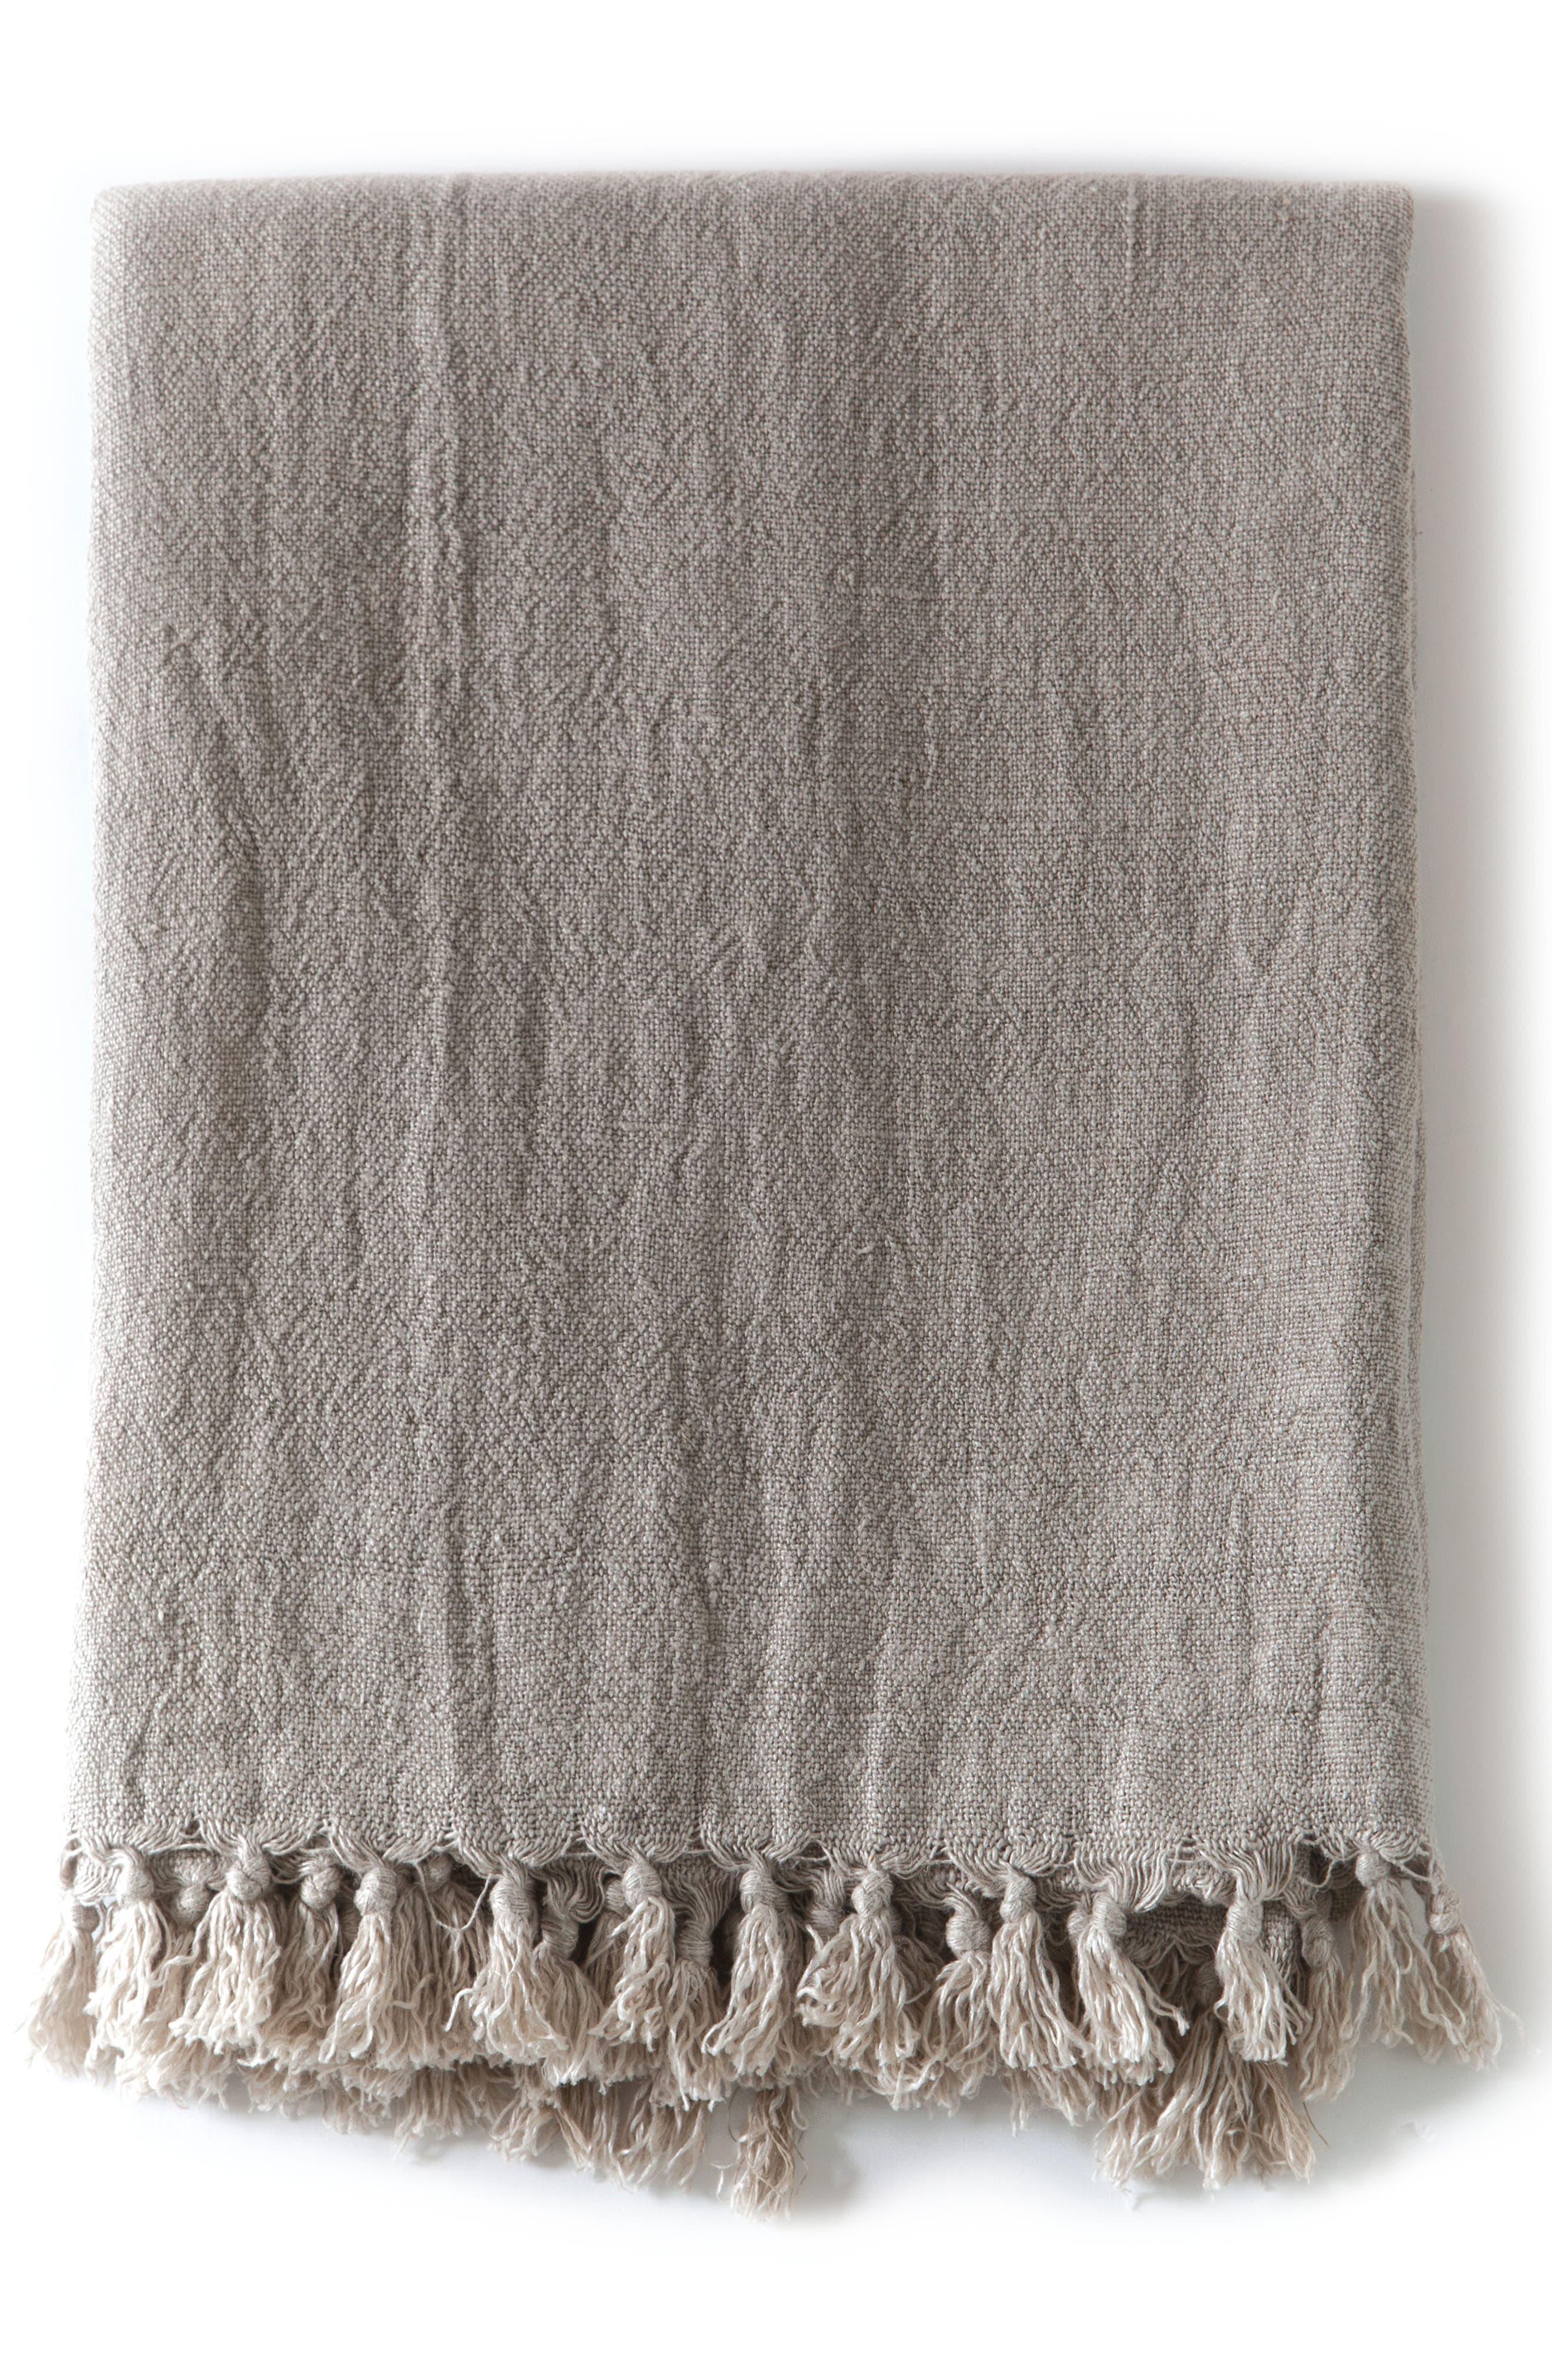 Alternate Image 1 Selected - Pom Pom at Home Montauk Big Throw Blanket